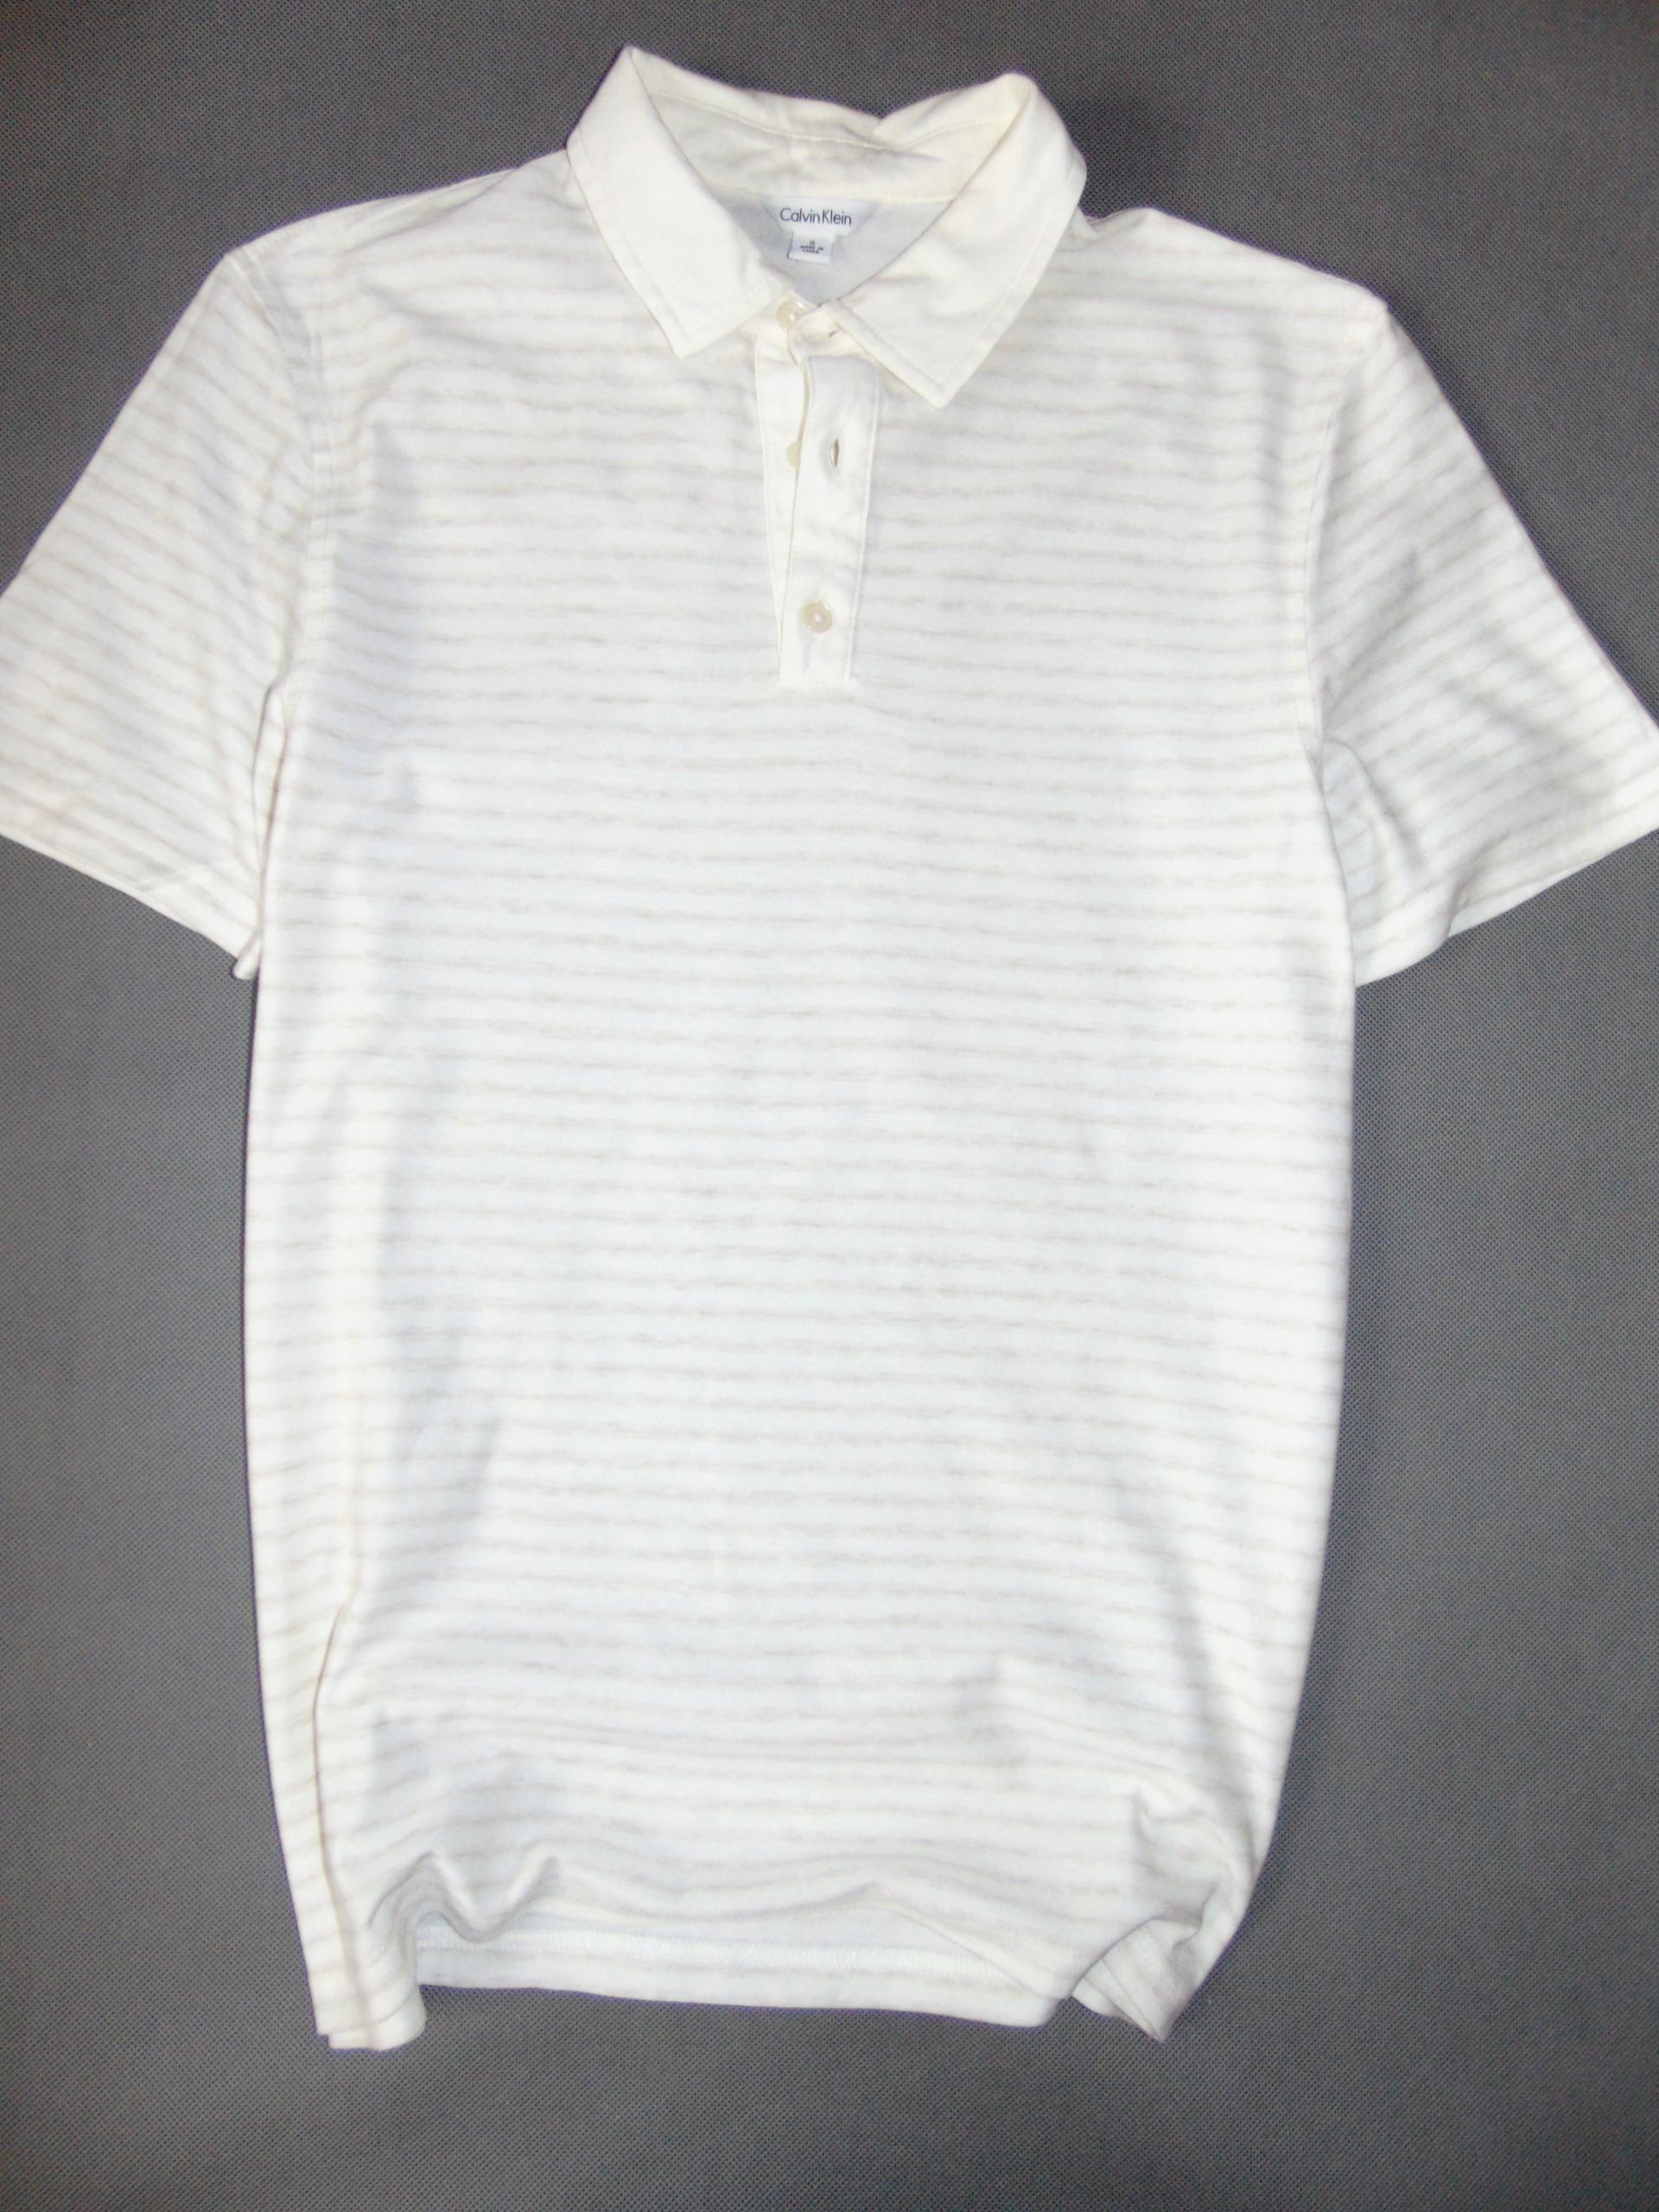 CALVIN KLEIN kapitalna koszulka męska polo r S